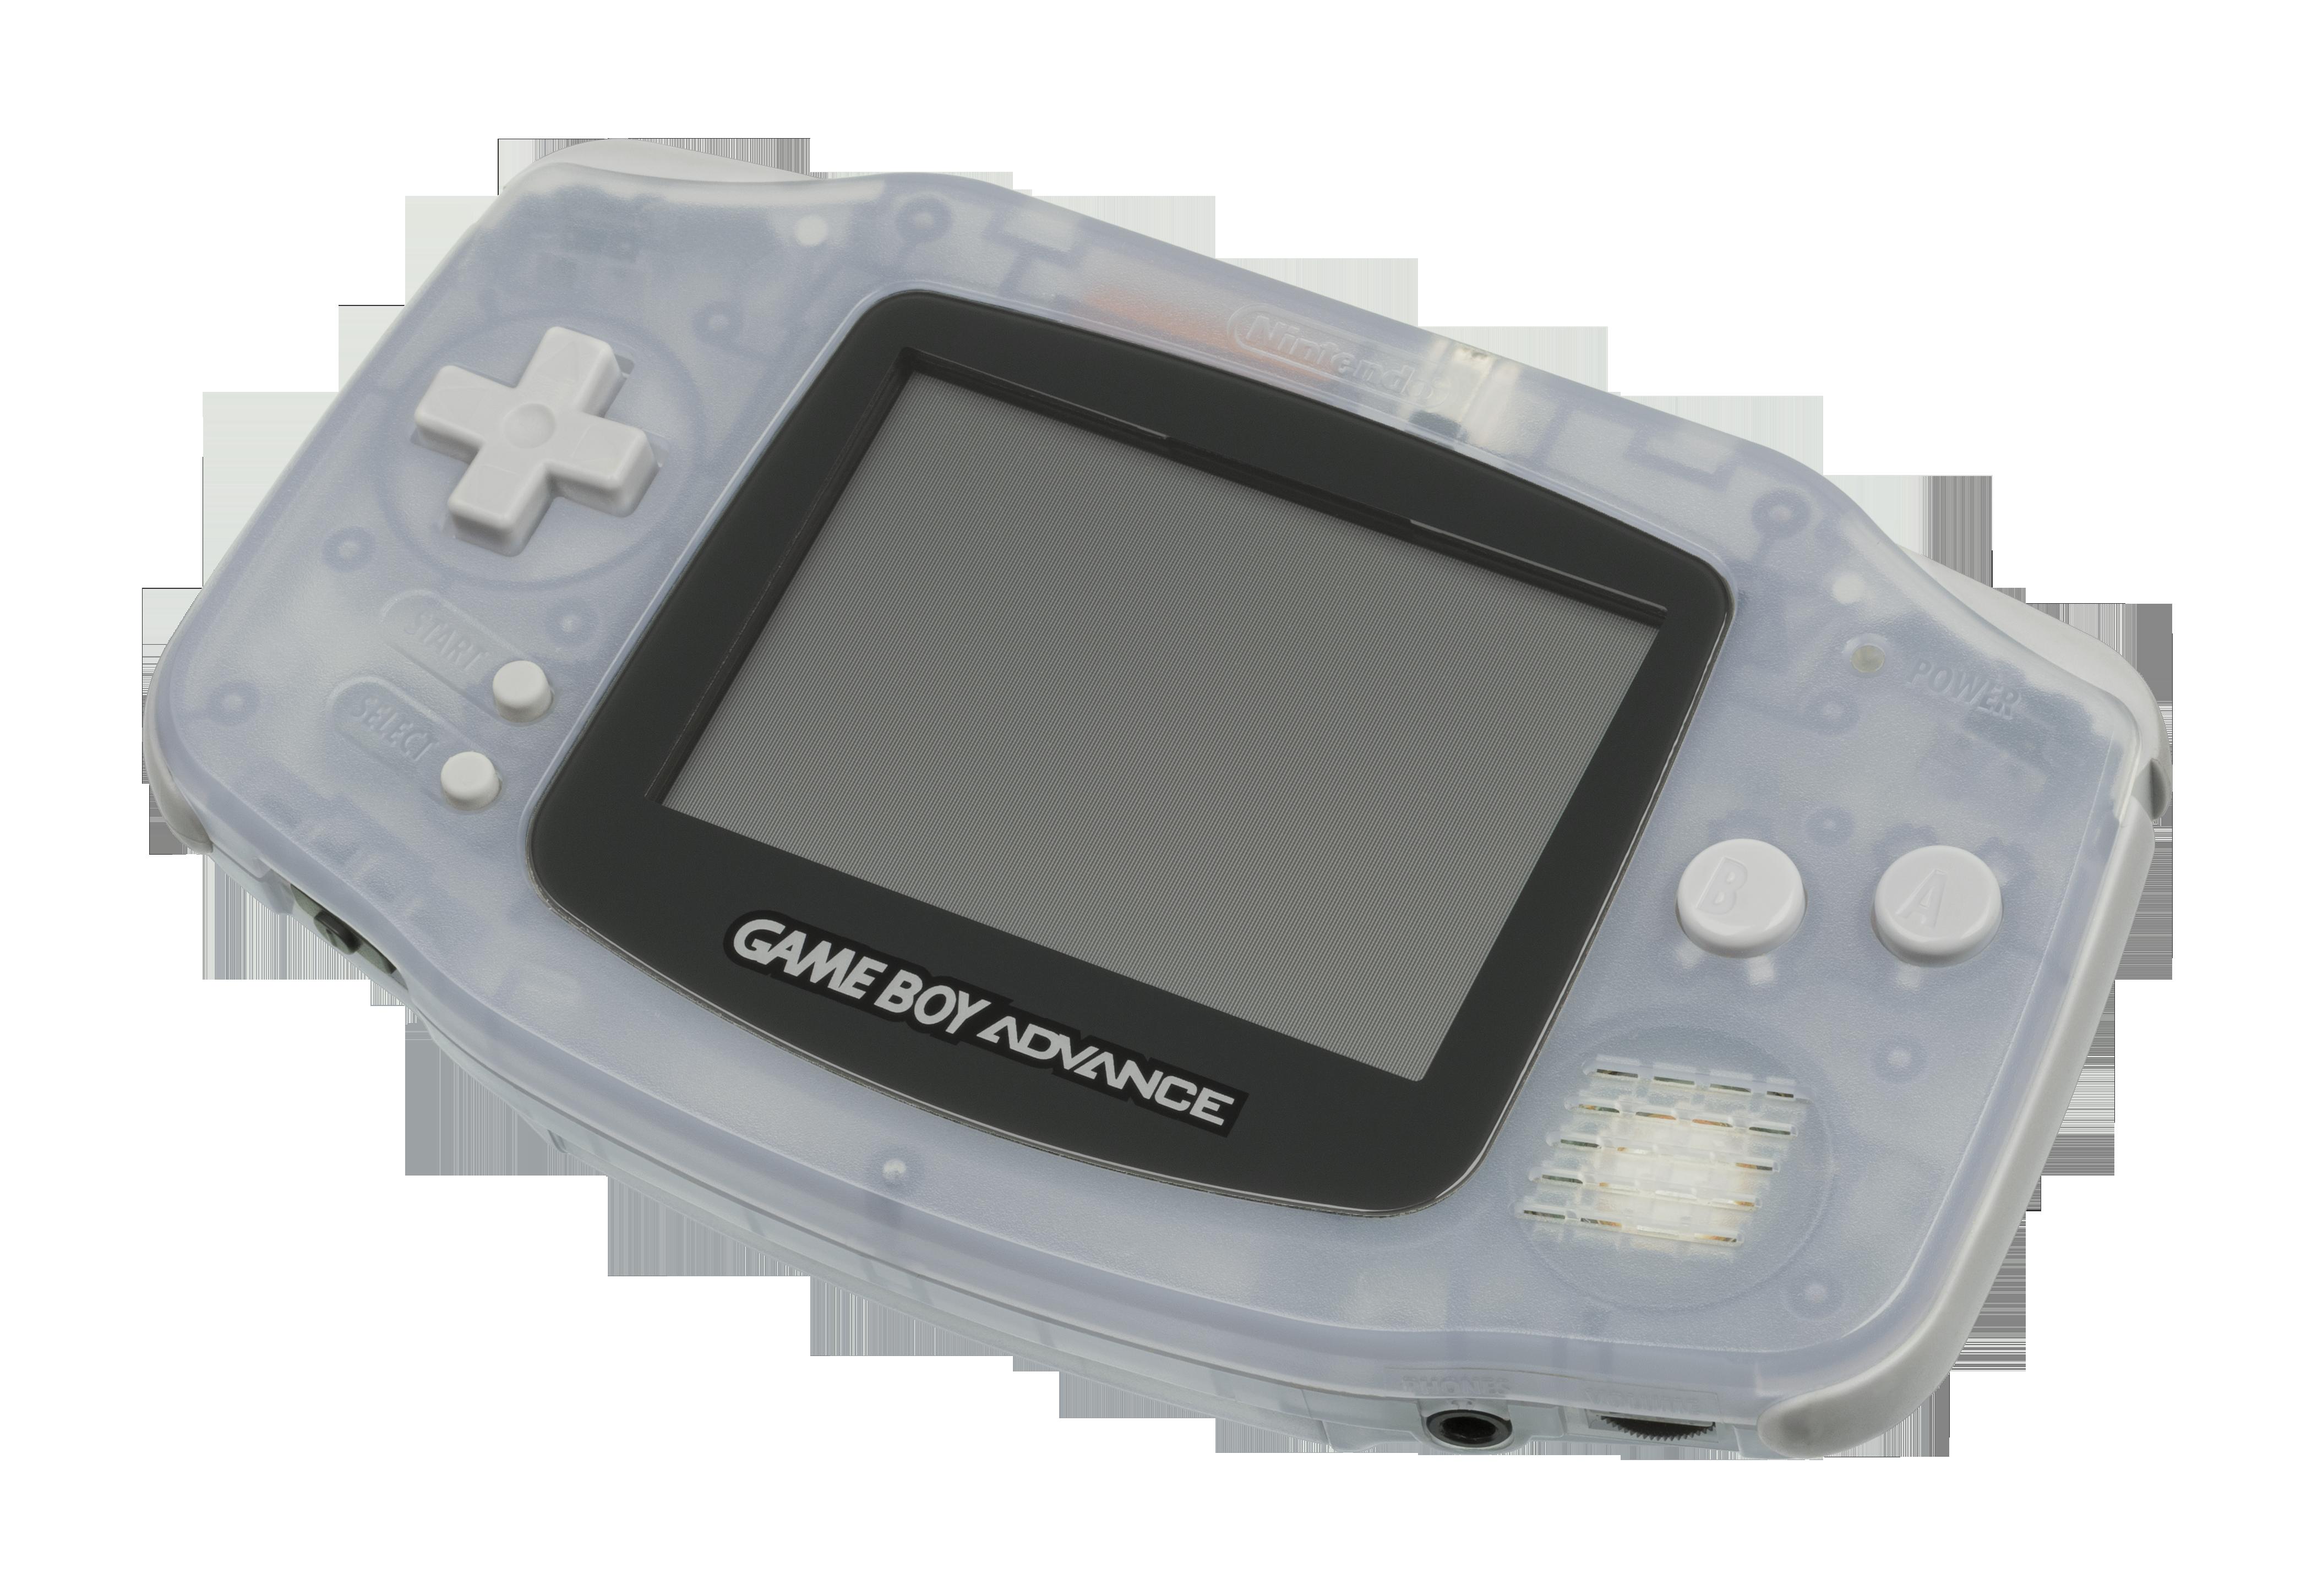 Game boy color kabel - Game Boy Color Kabel 20